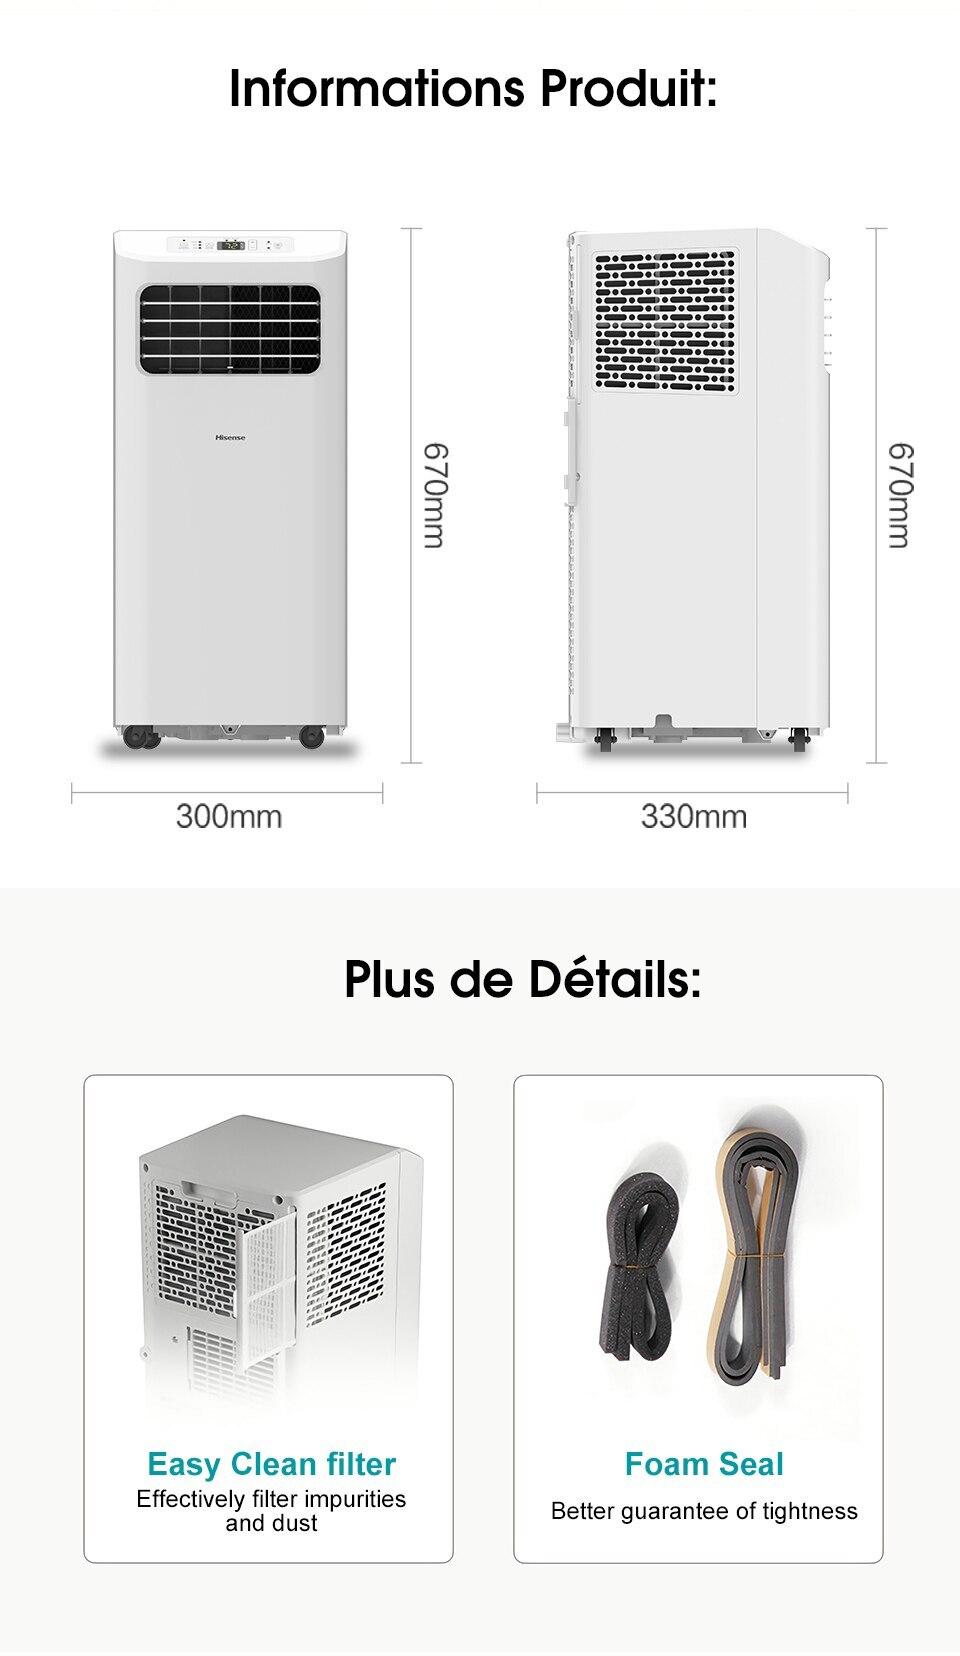 Hisense-climatiseur-mobile-HPAC07V-de-11.jpg